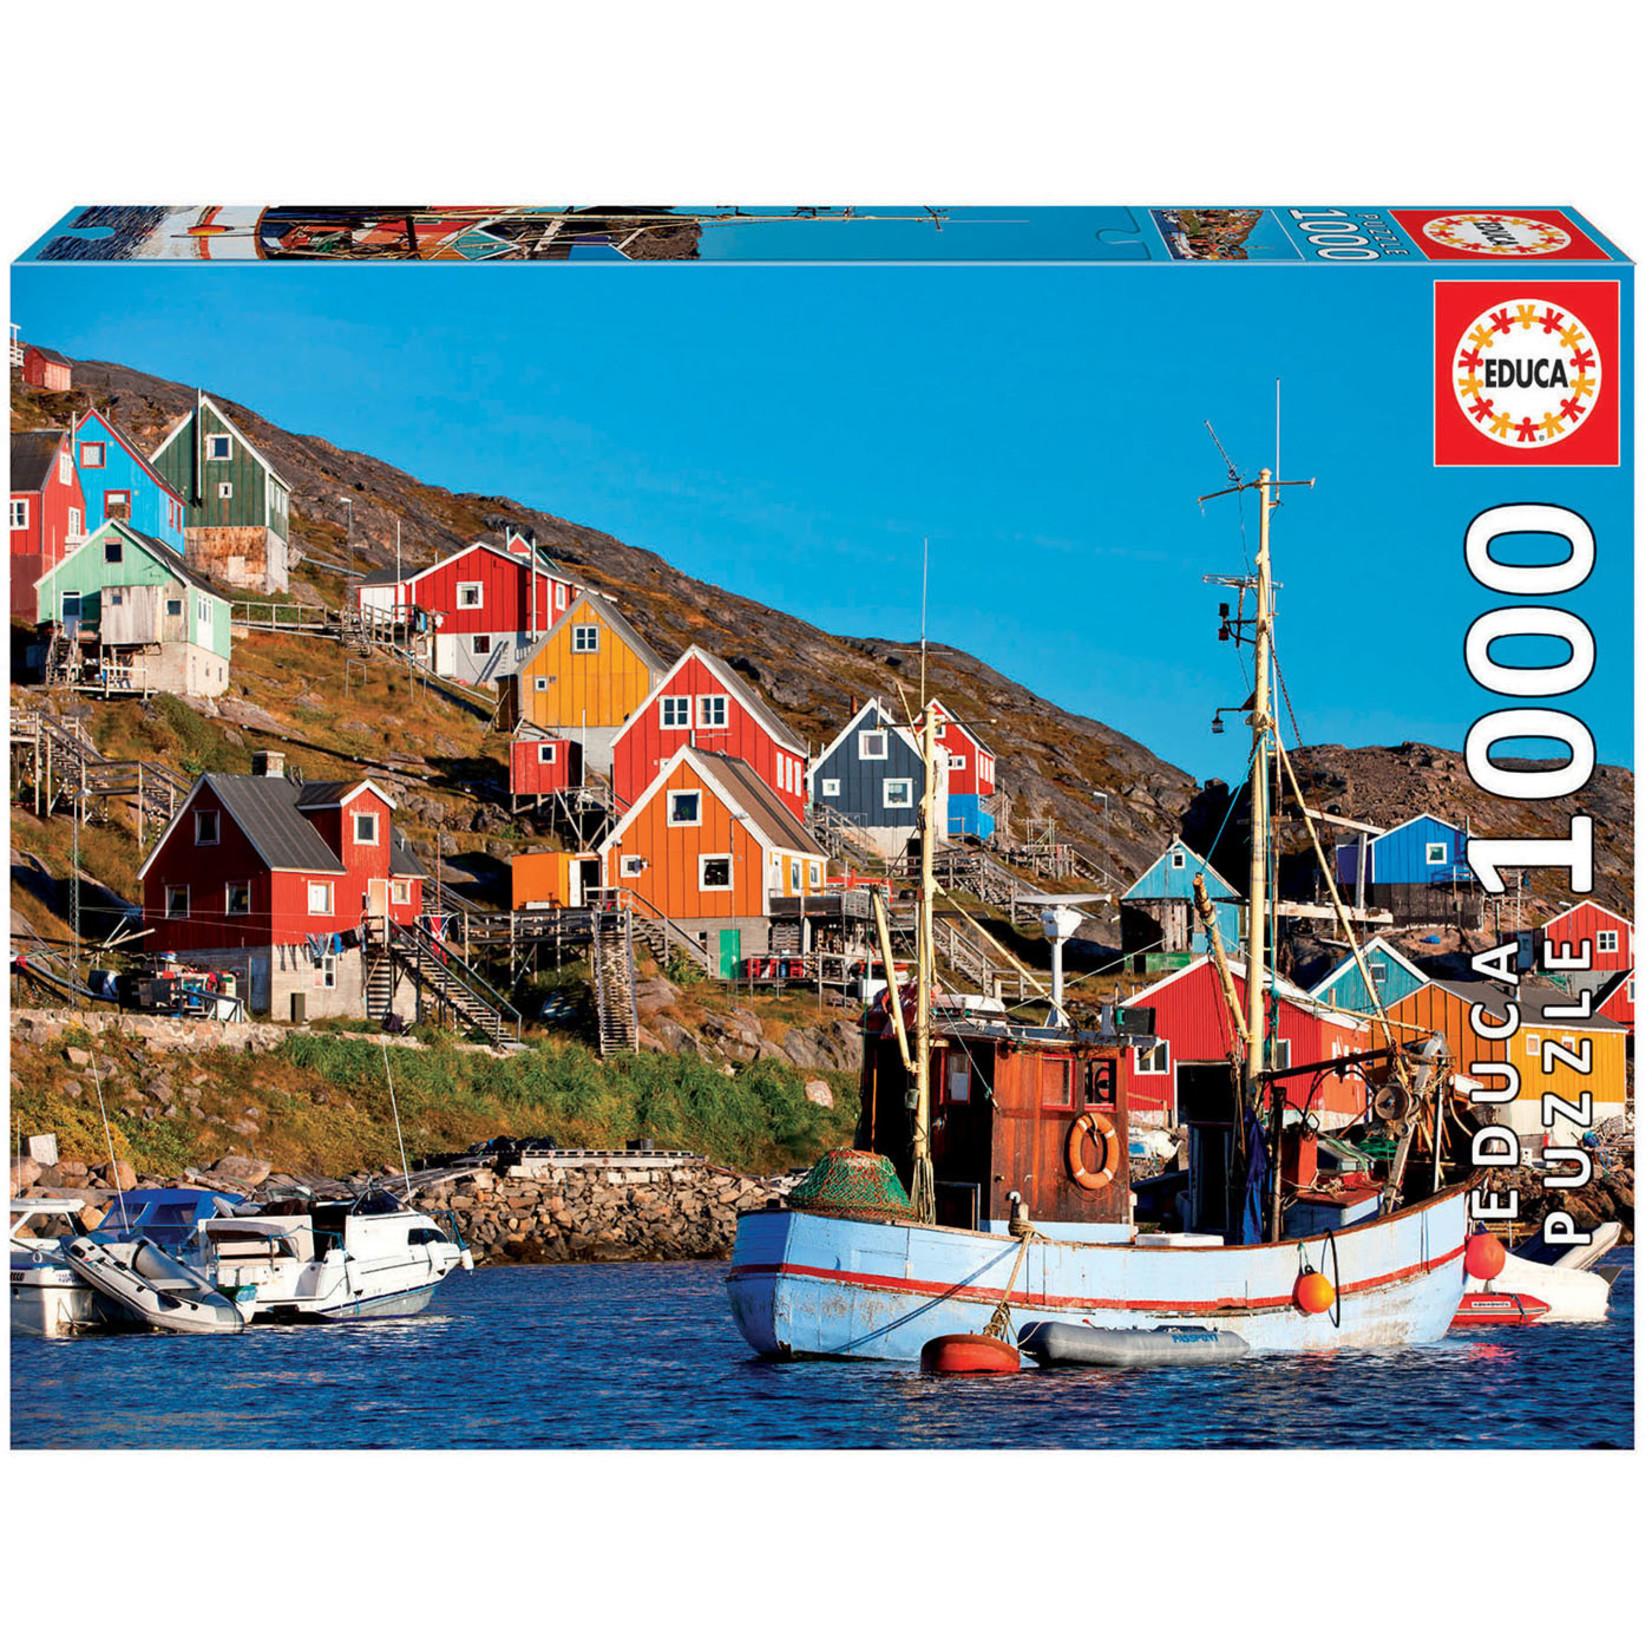 Educa Puzzles Nordic Houses 1000pc